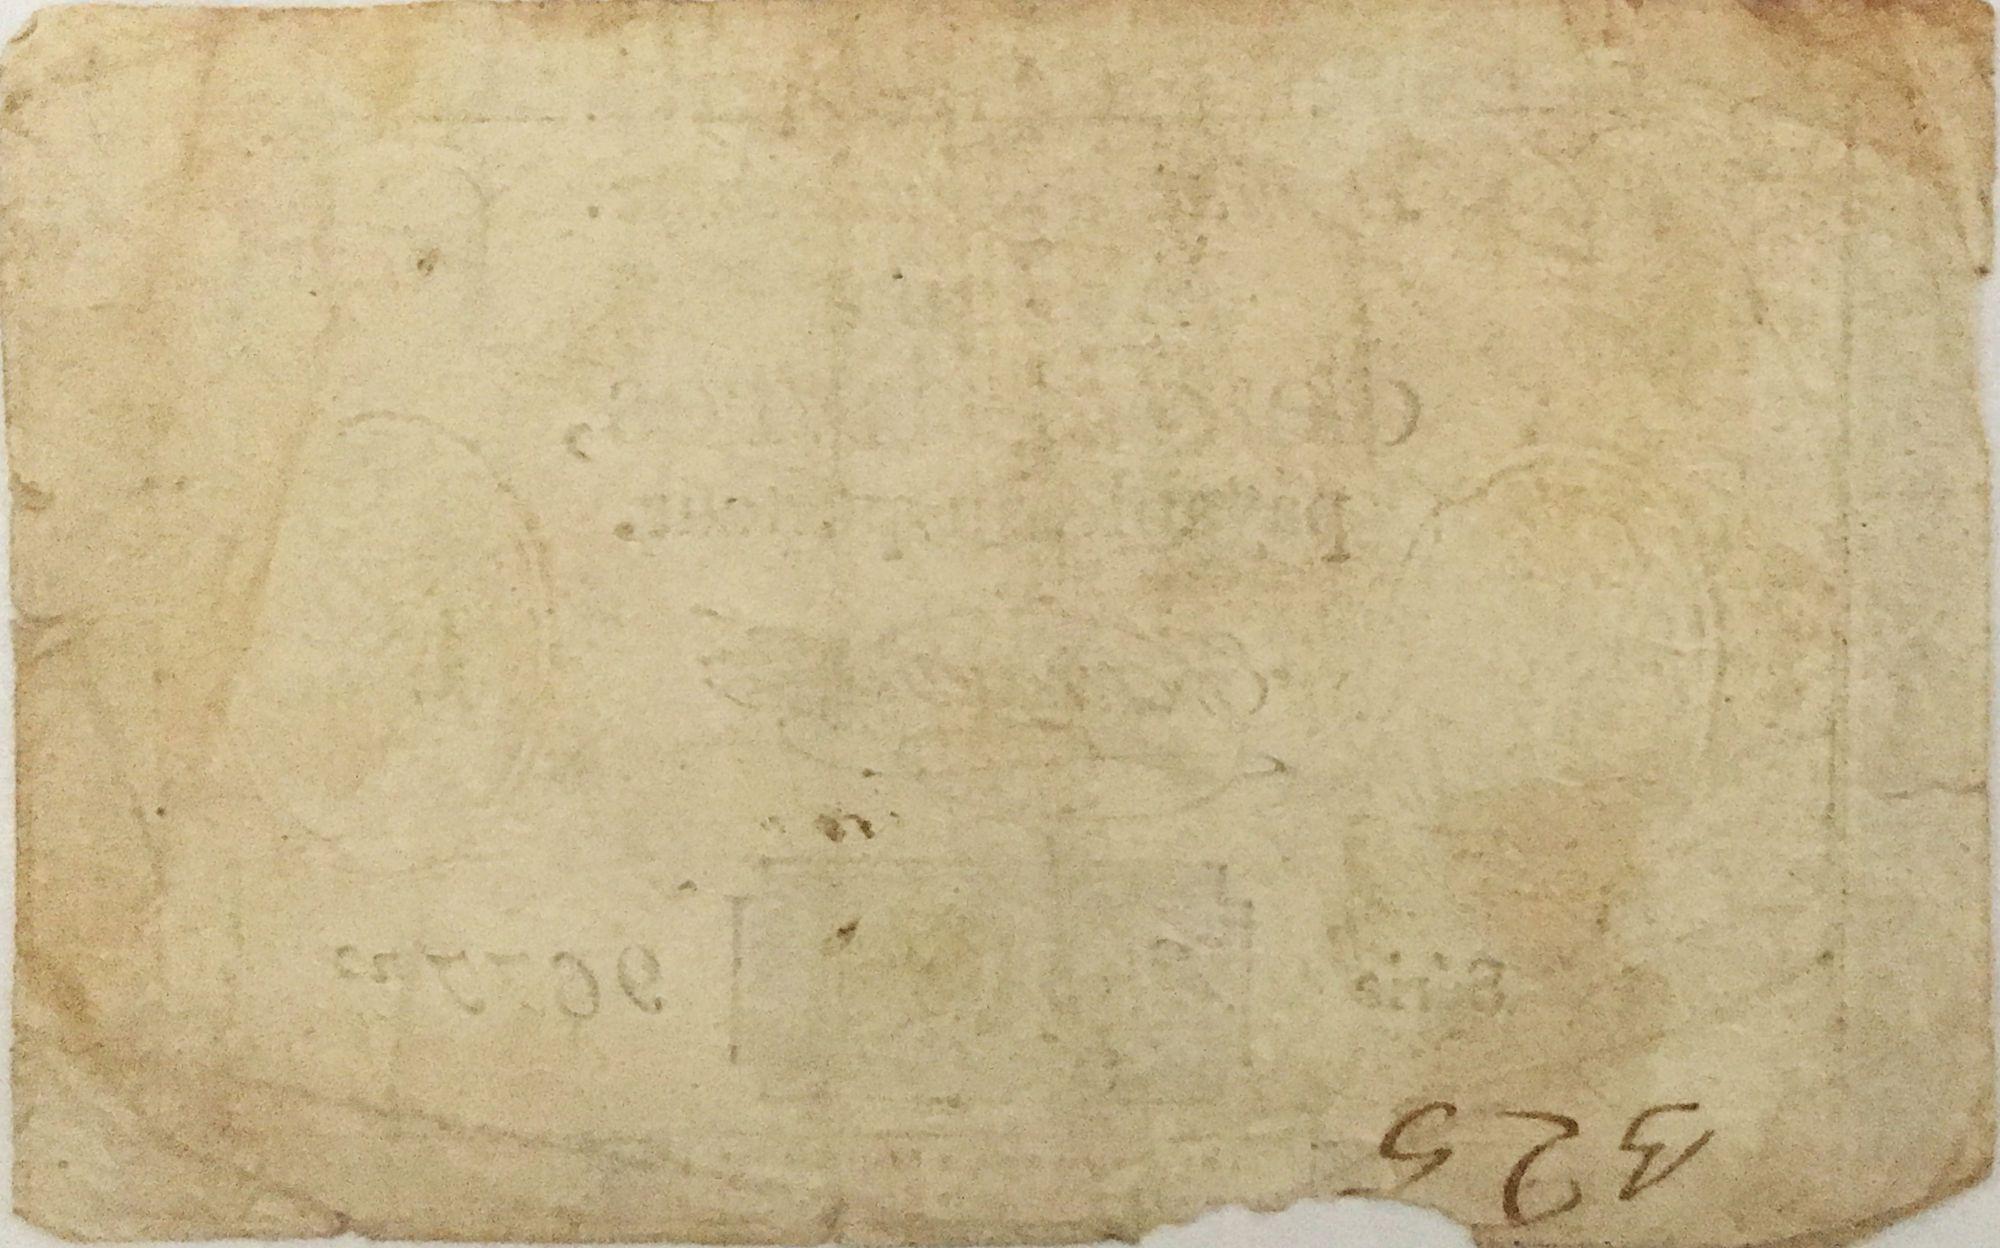 France 10 Livres Black Watermark Republique (24-10-1792) - Sign. Taisaud - Serial 9677 - G+